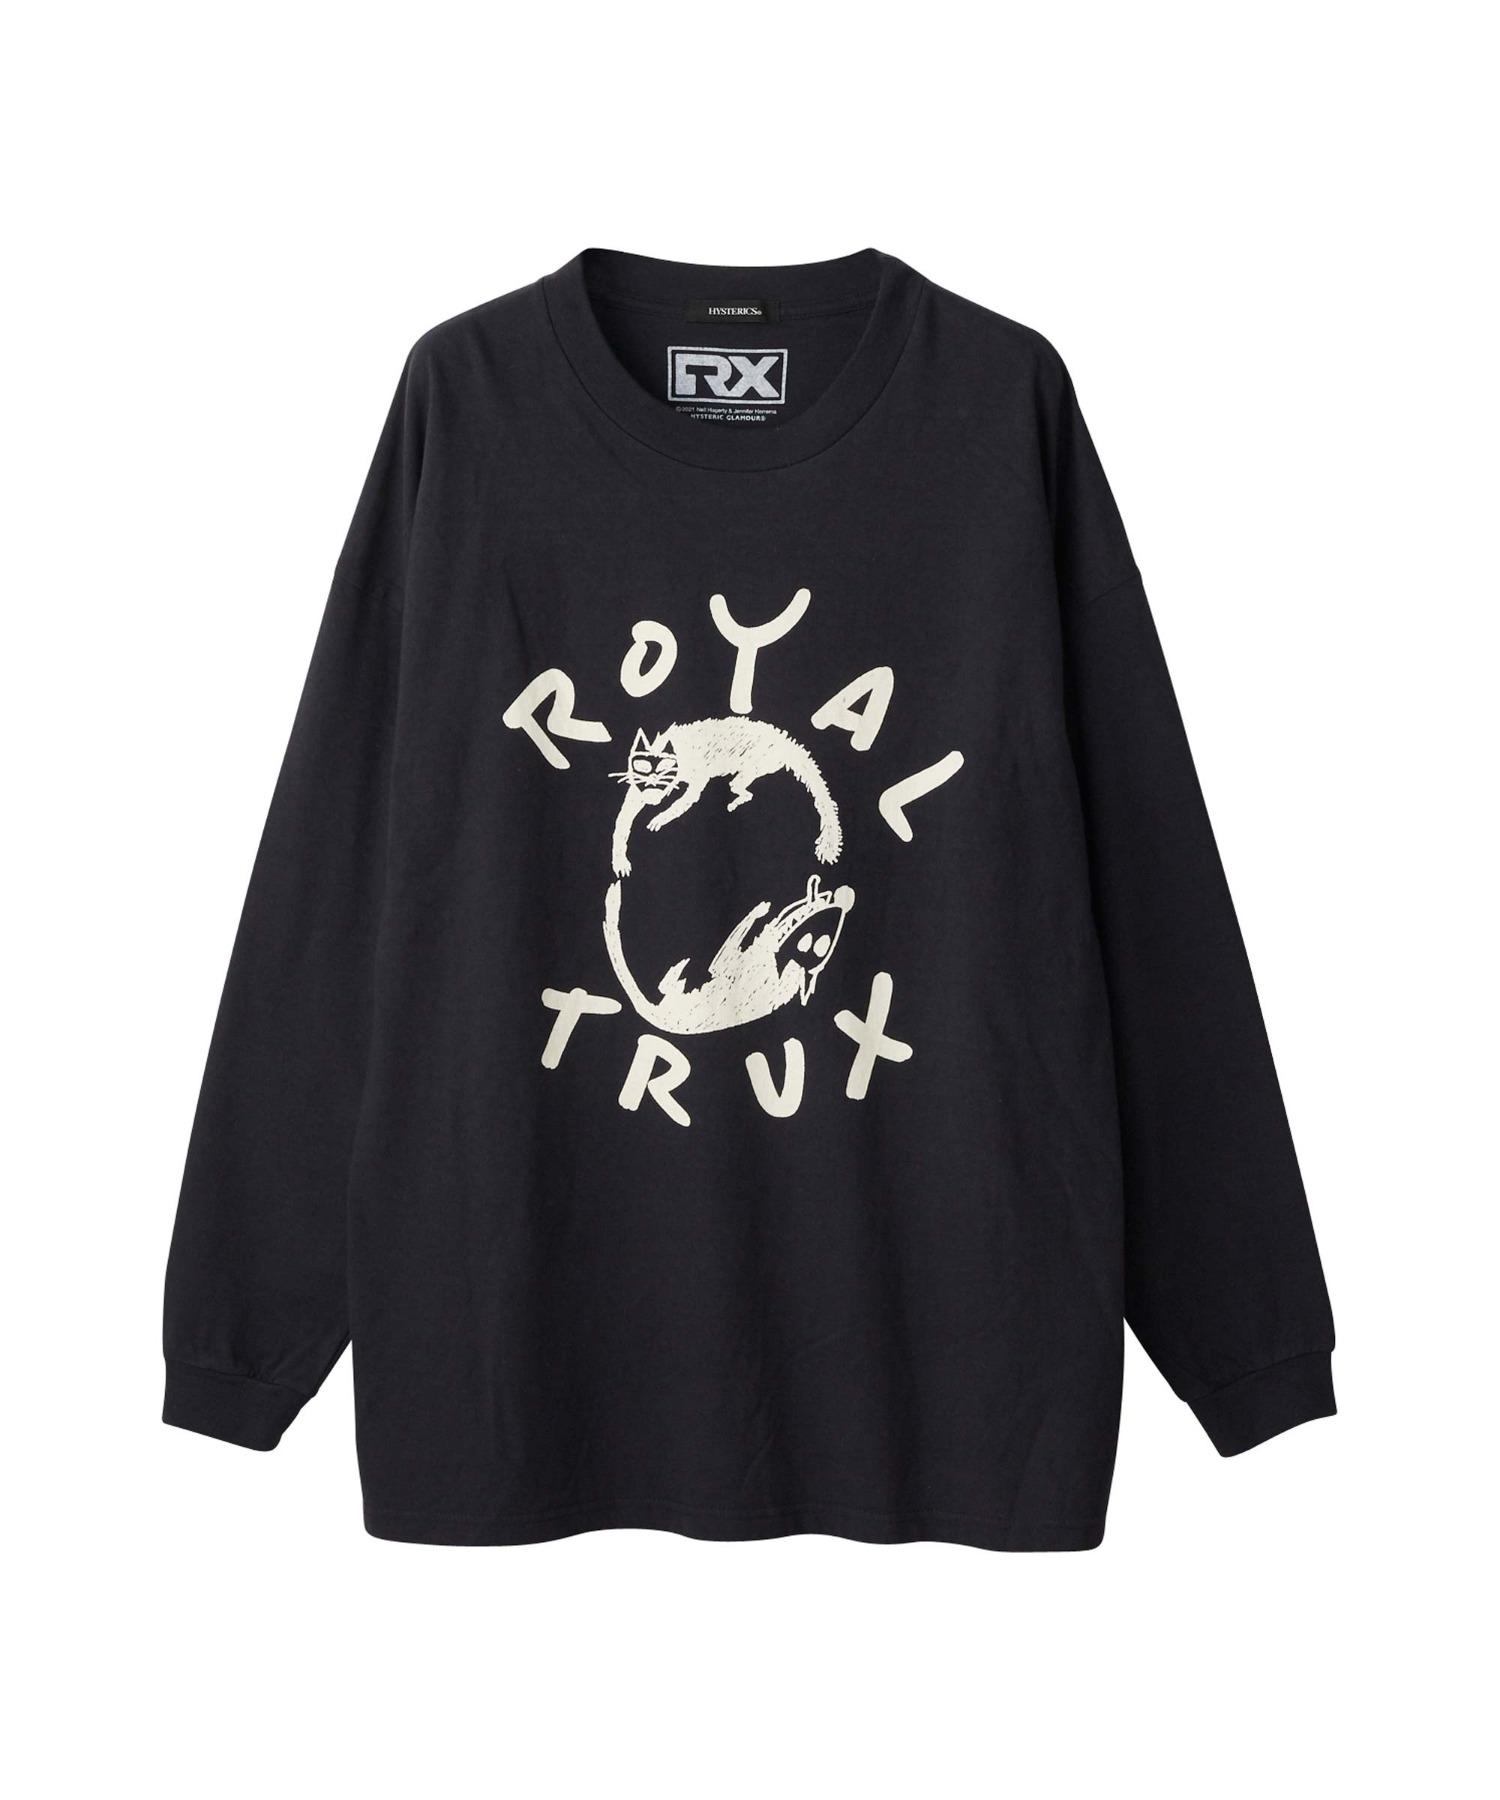 ROYAL TRUX/CATS AND DOGS オーバーサイズTシャツ